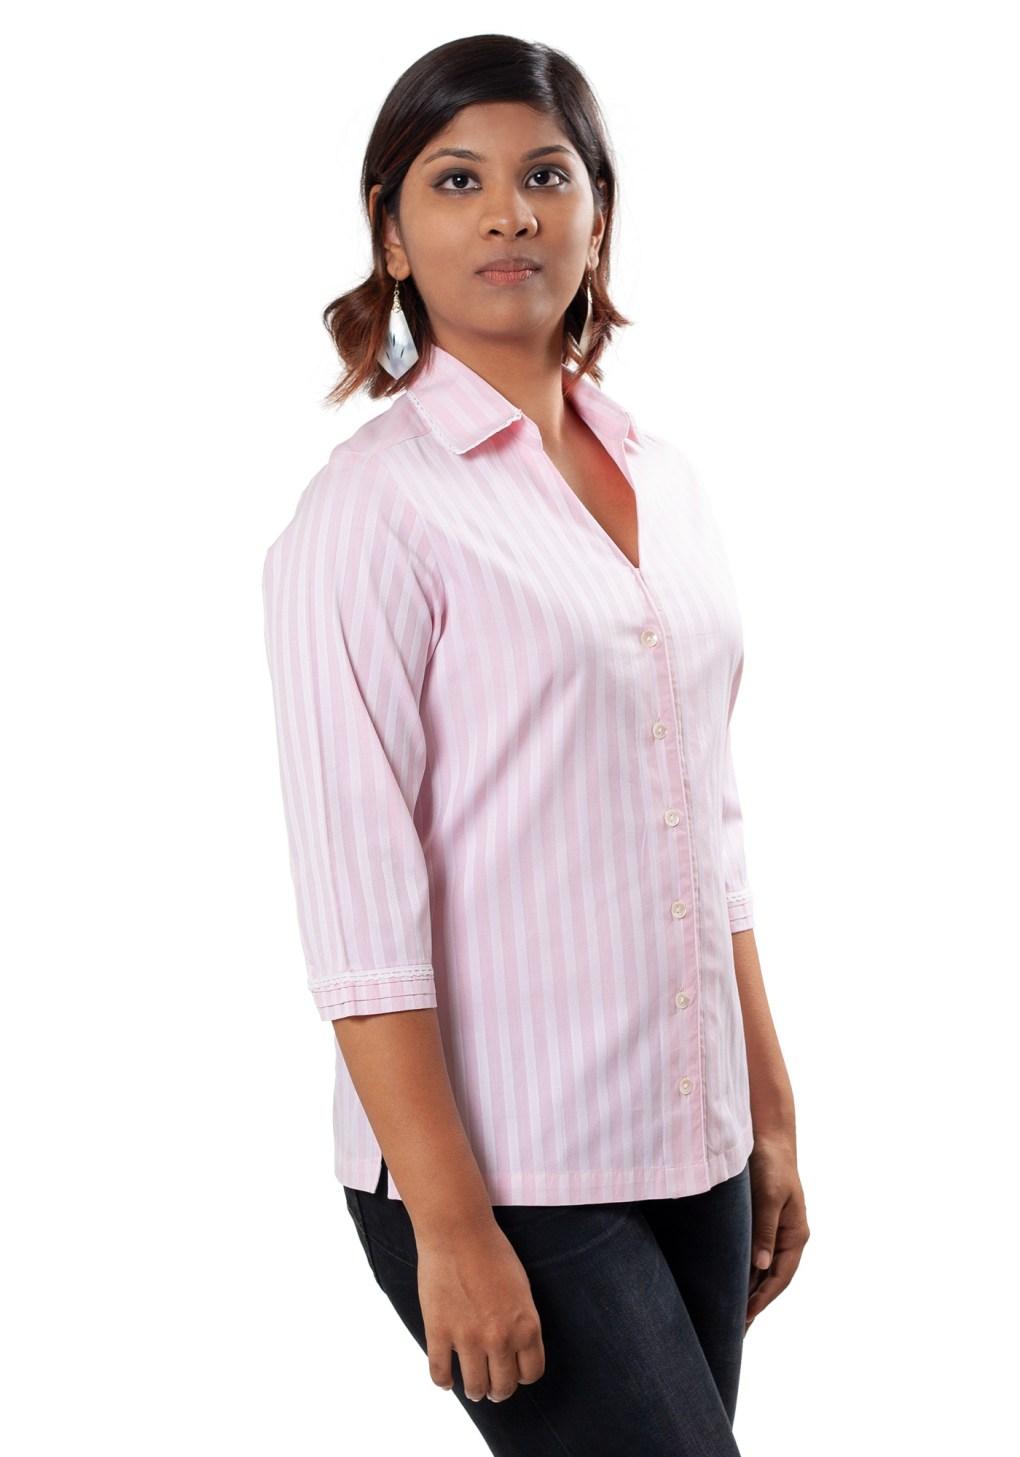 MINC ecofashion Classic Striped Pink Cotton Shirt